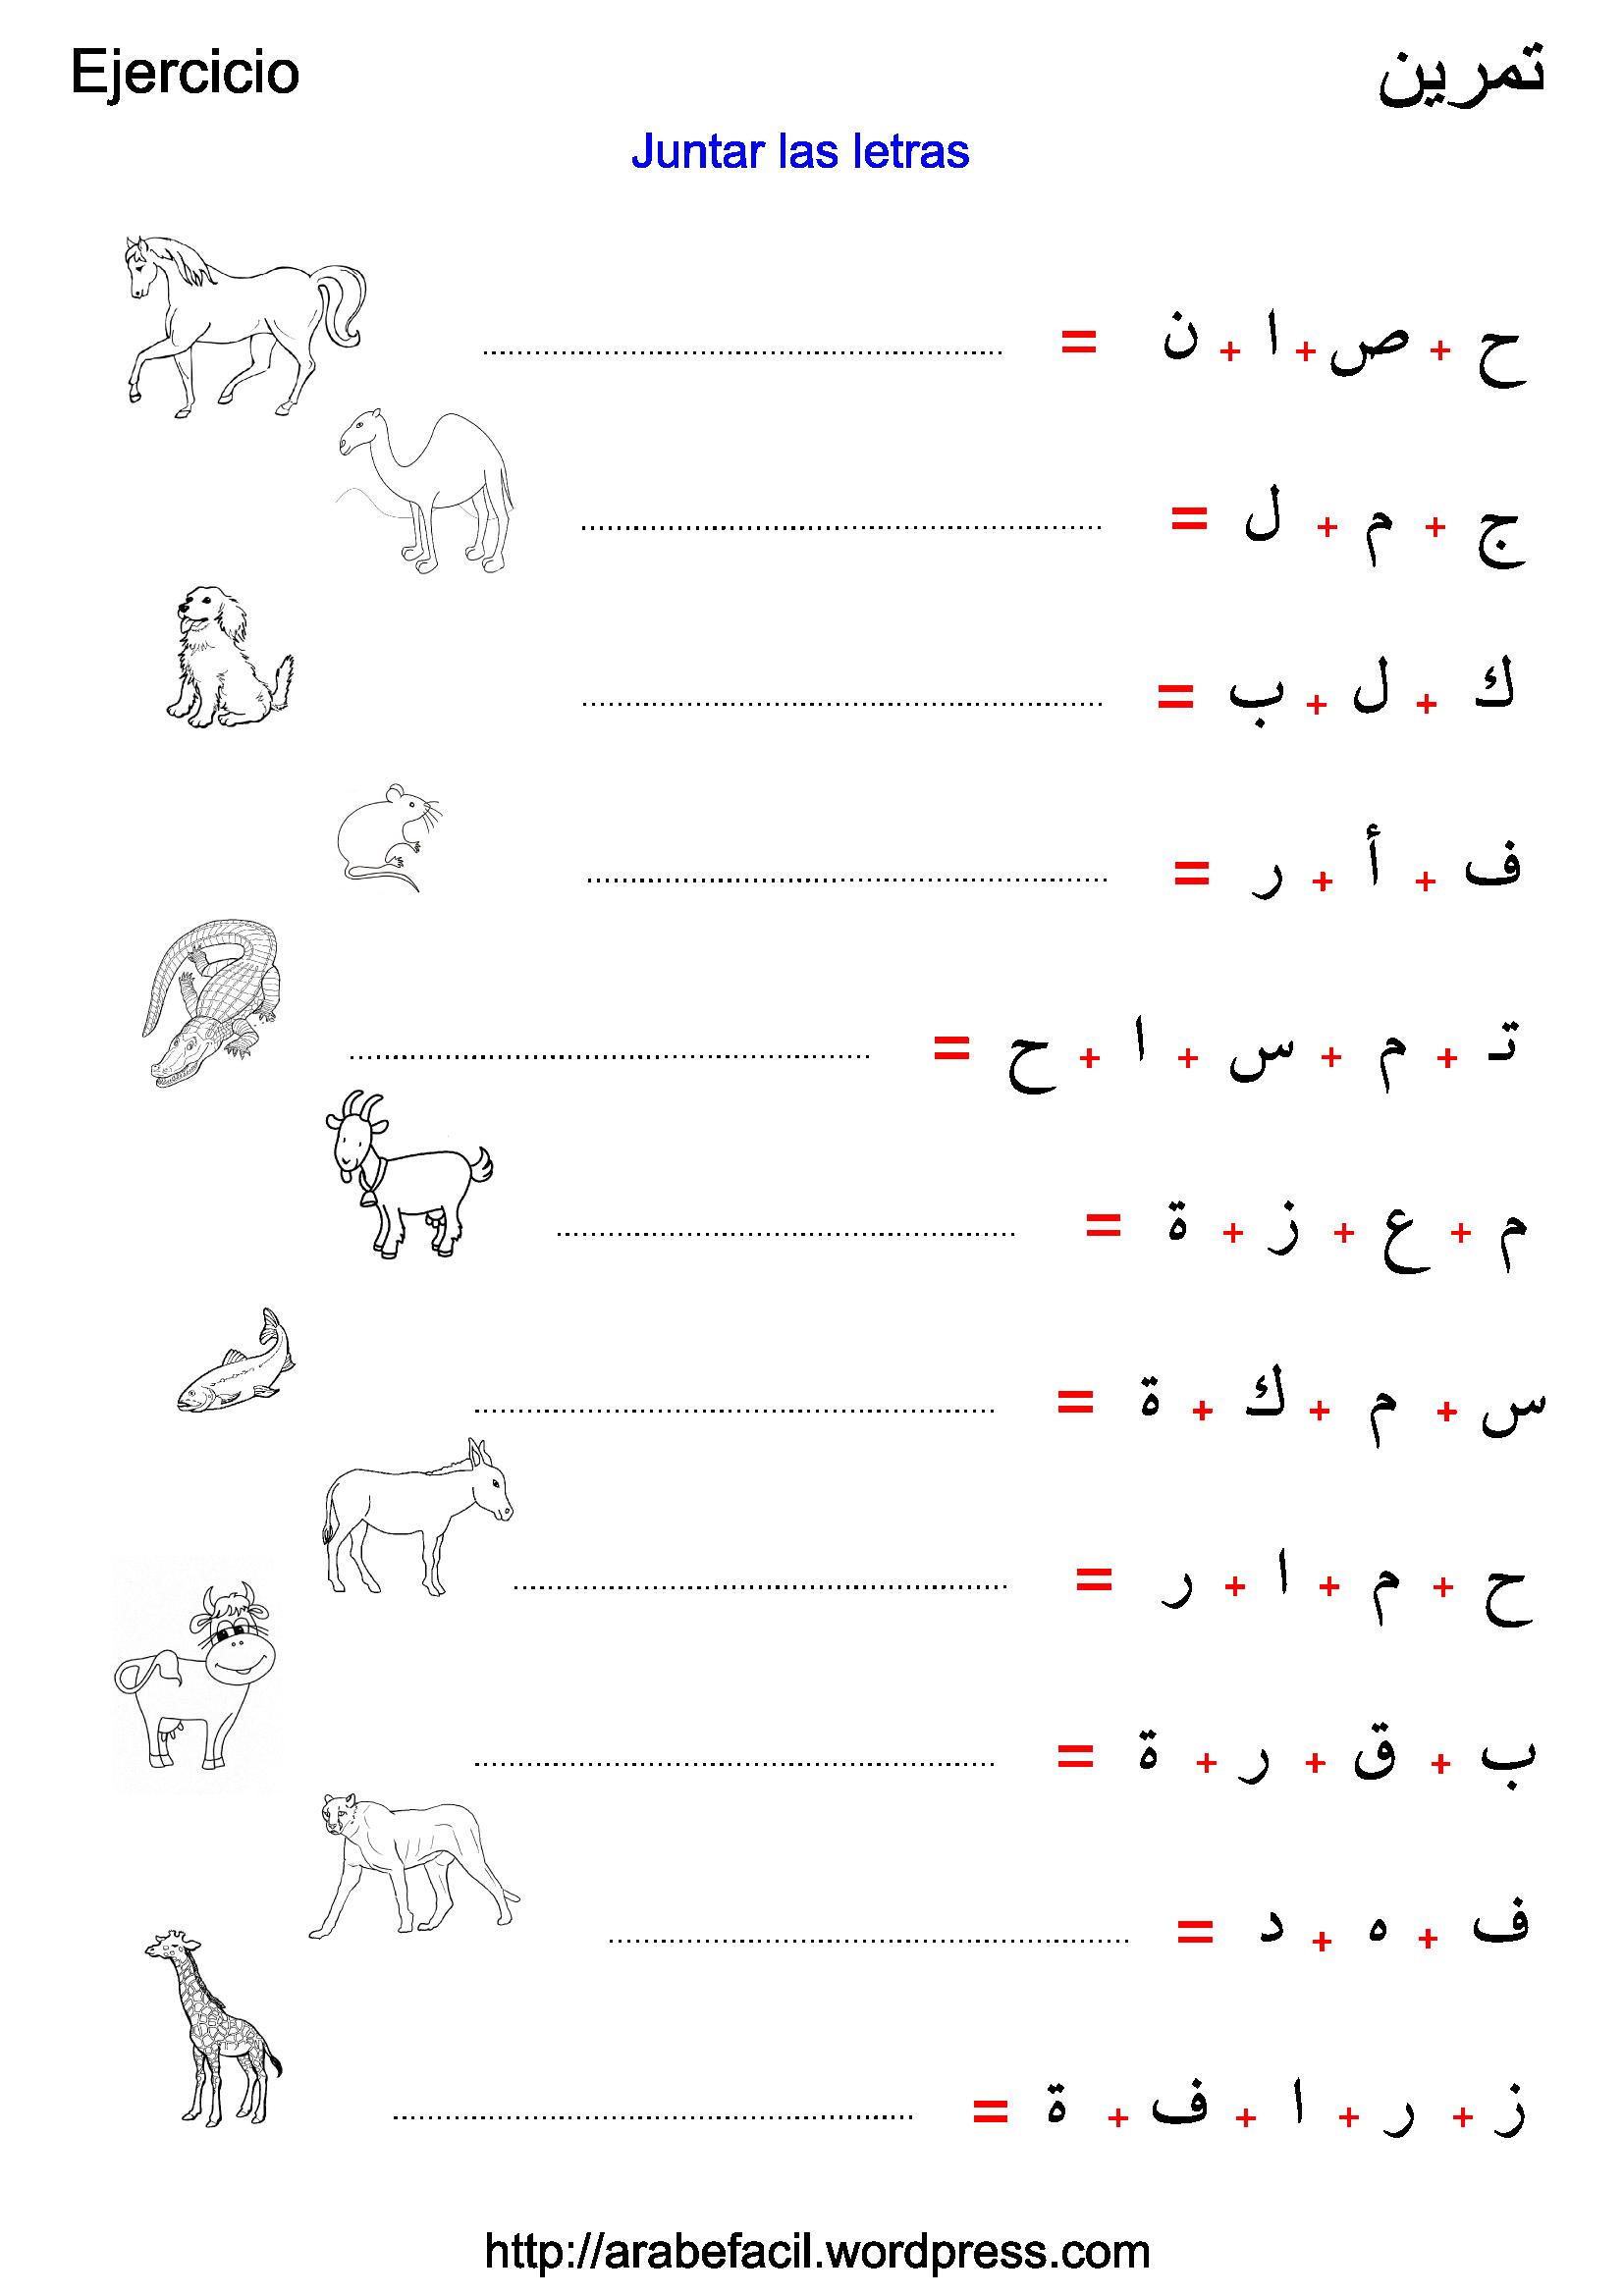 juntarlasletras.png (1654×2339) Apprendre l'arabe